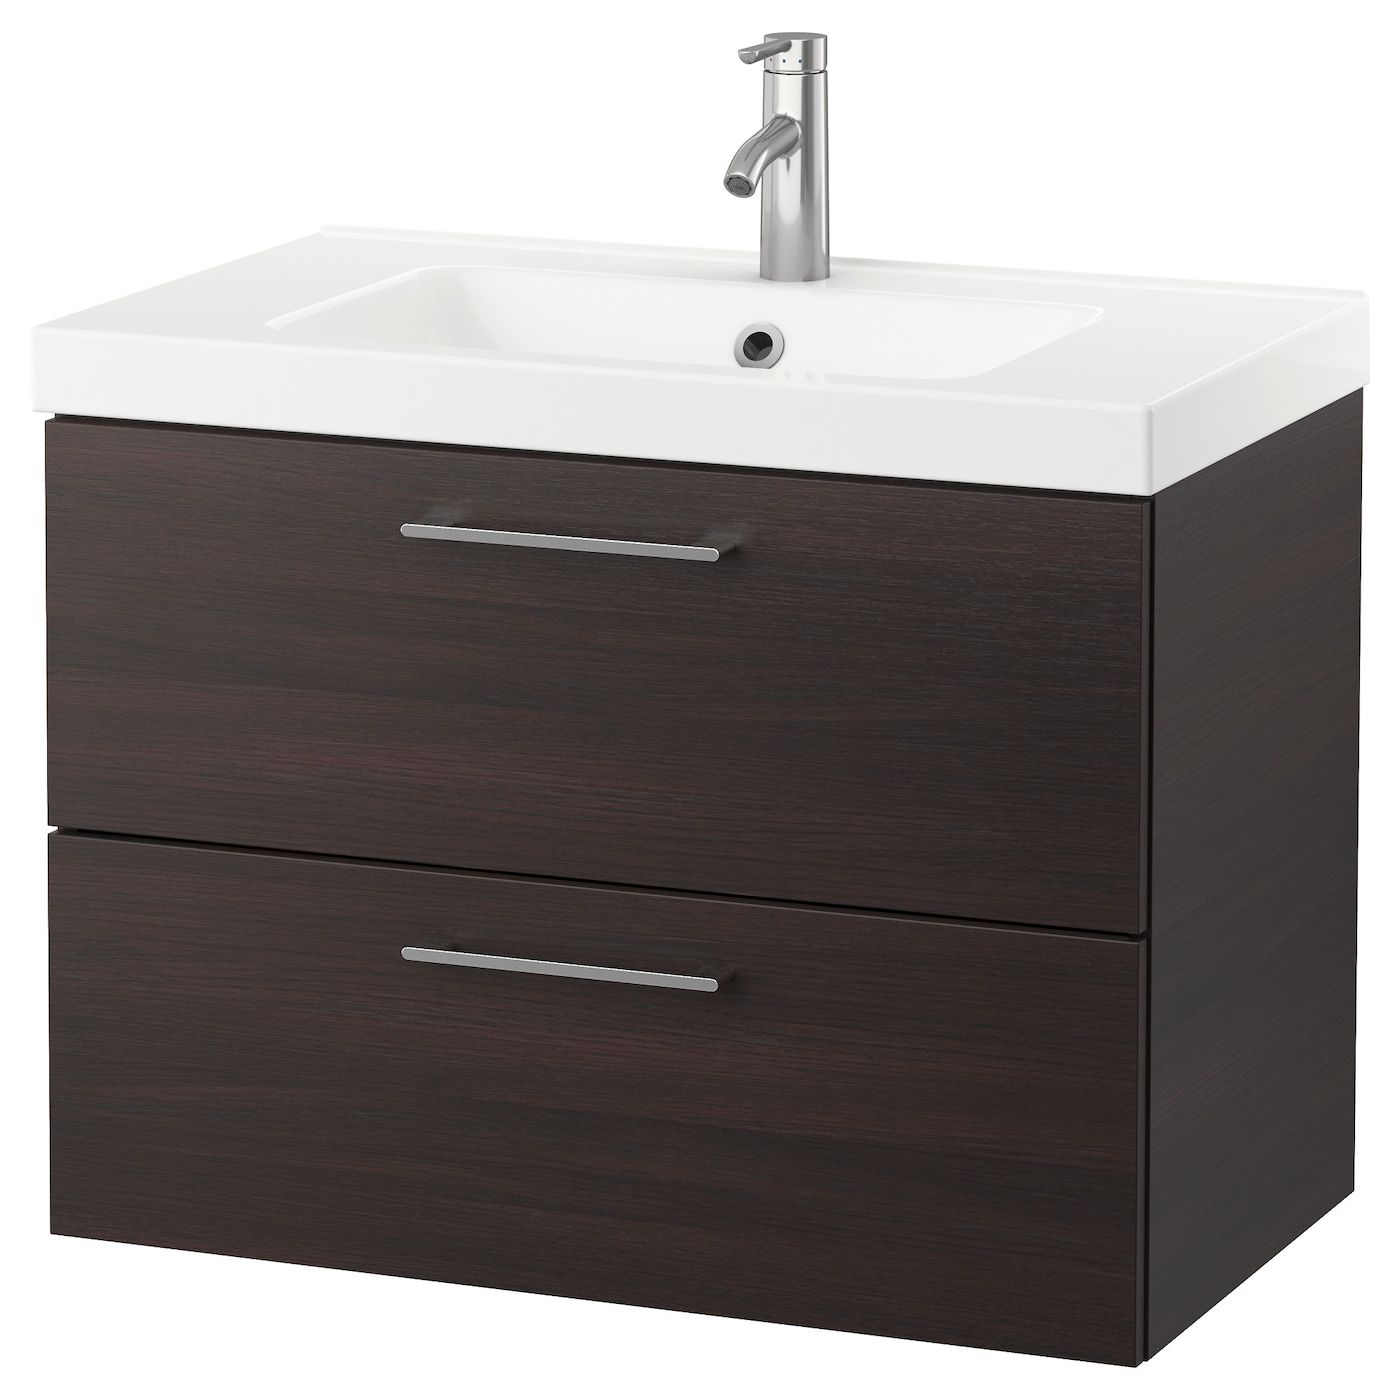 600mm Wall Hung Bathroom Vanity Unit /& Basin Sink Pacific Walnut Modern